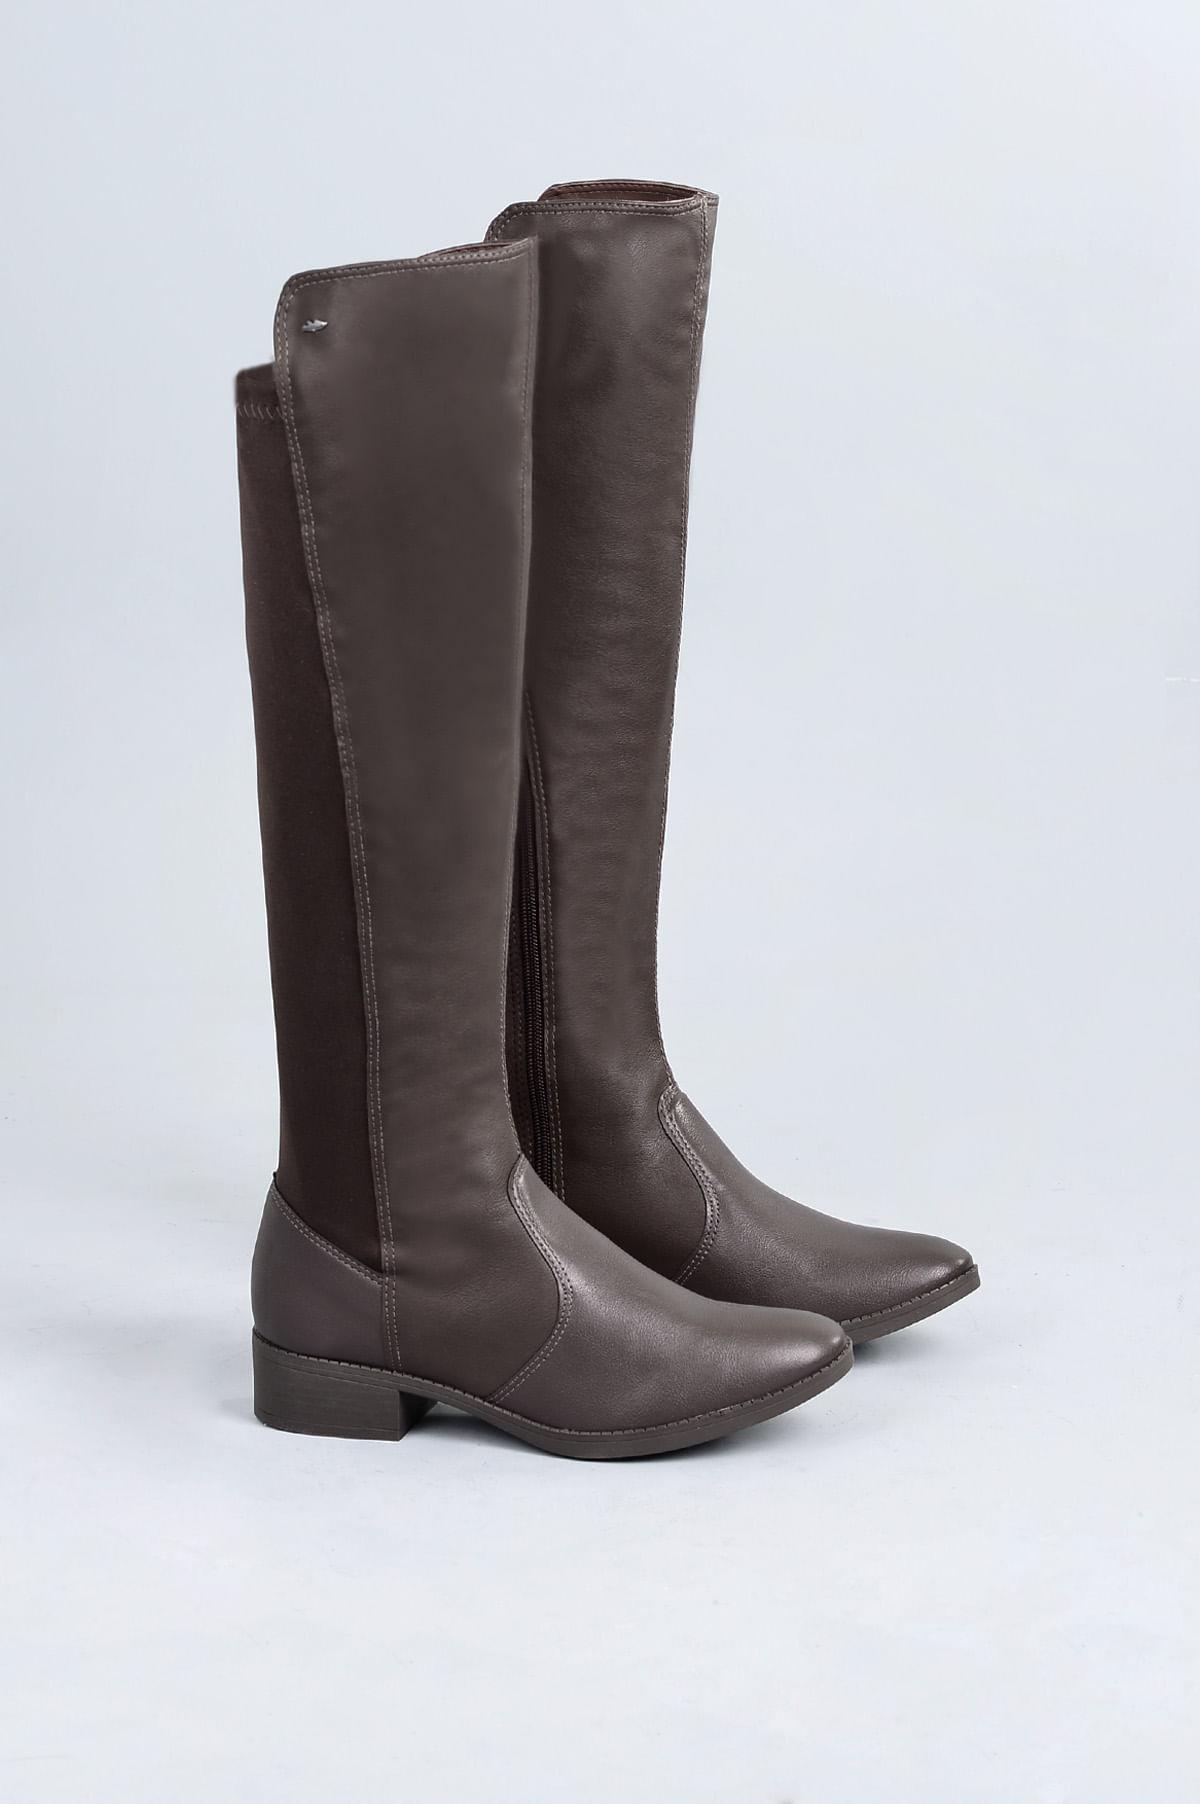 35abbb09b Bota Feminina Salto Baixo Medly Dakota SINT - CAFE - Mundial Calçados